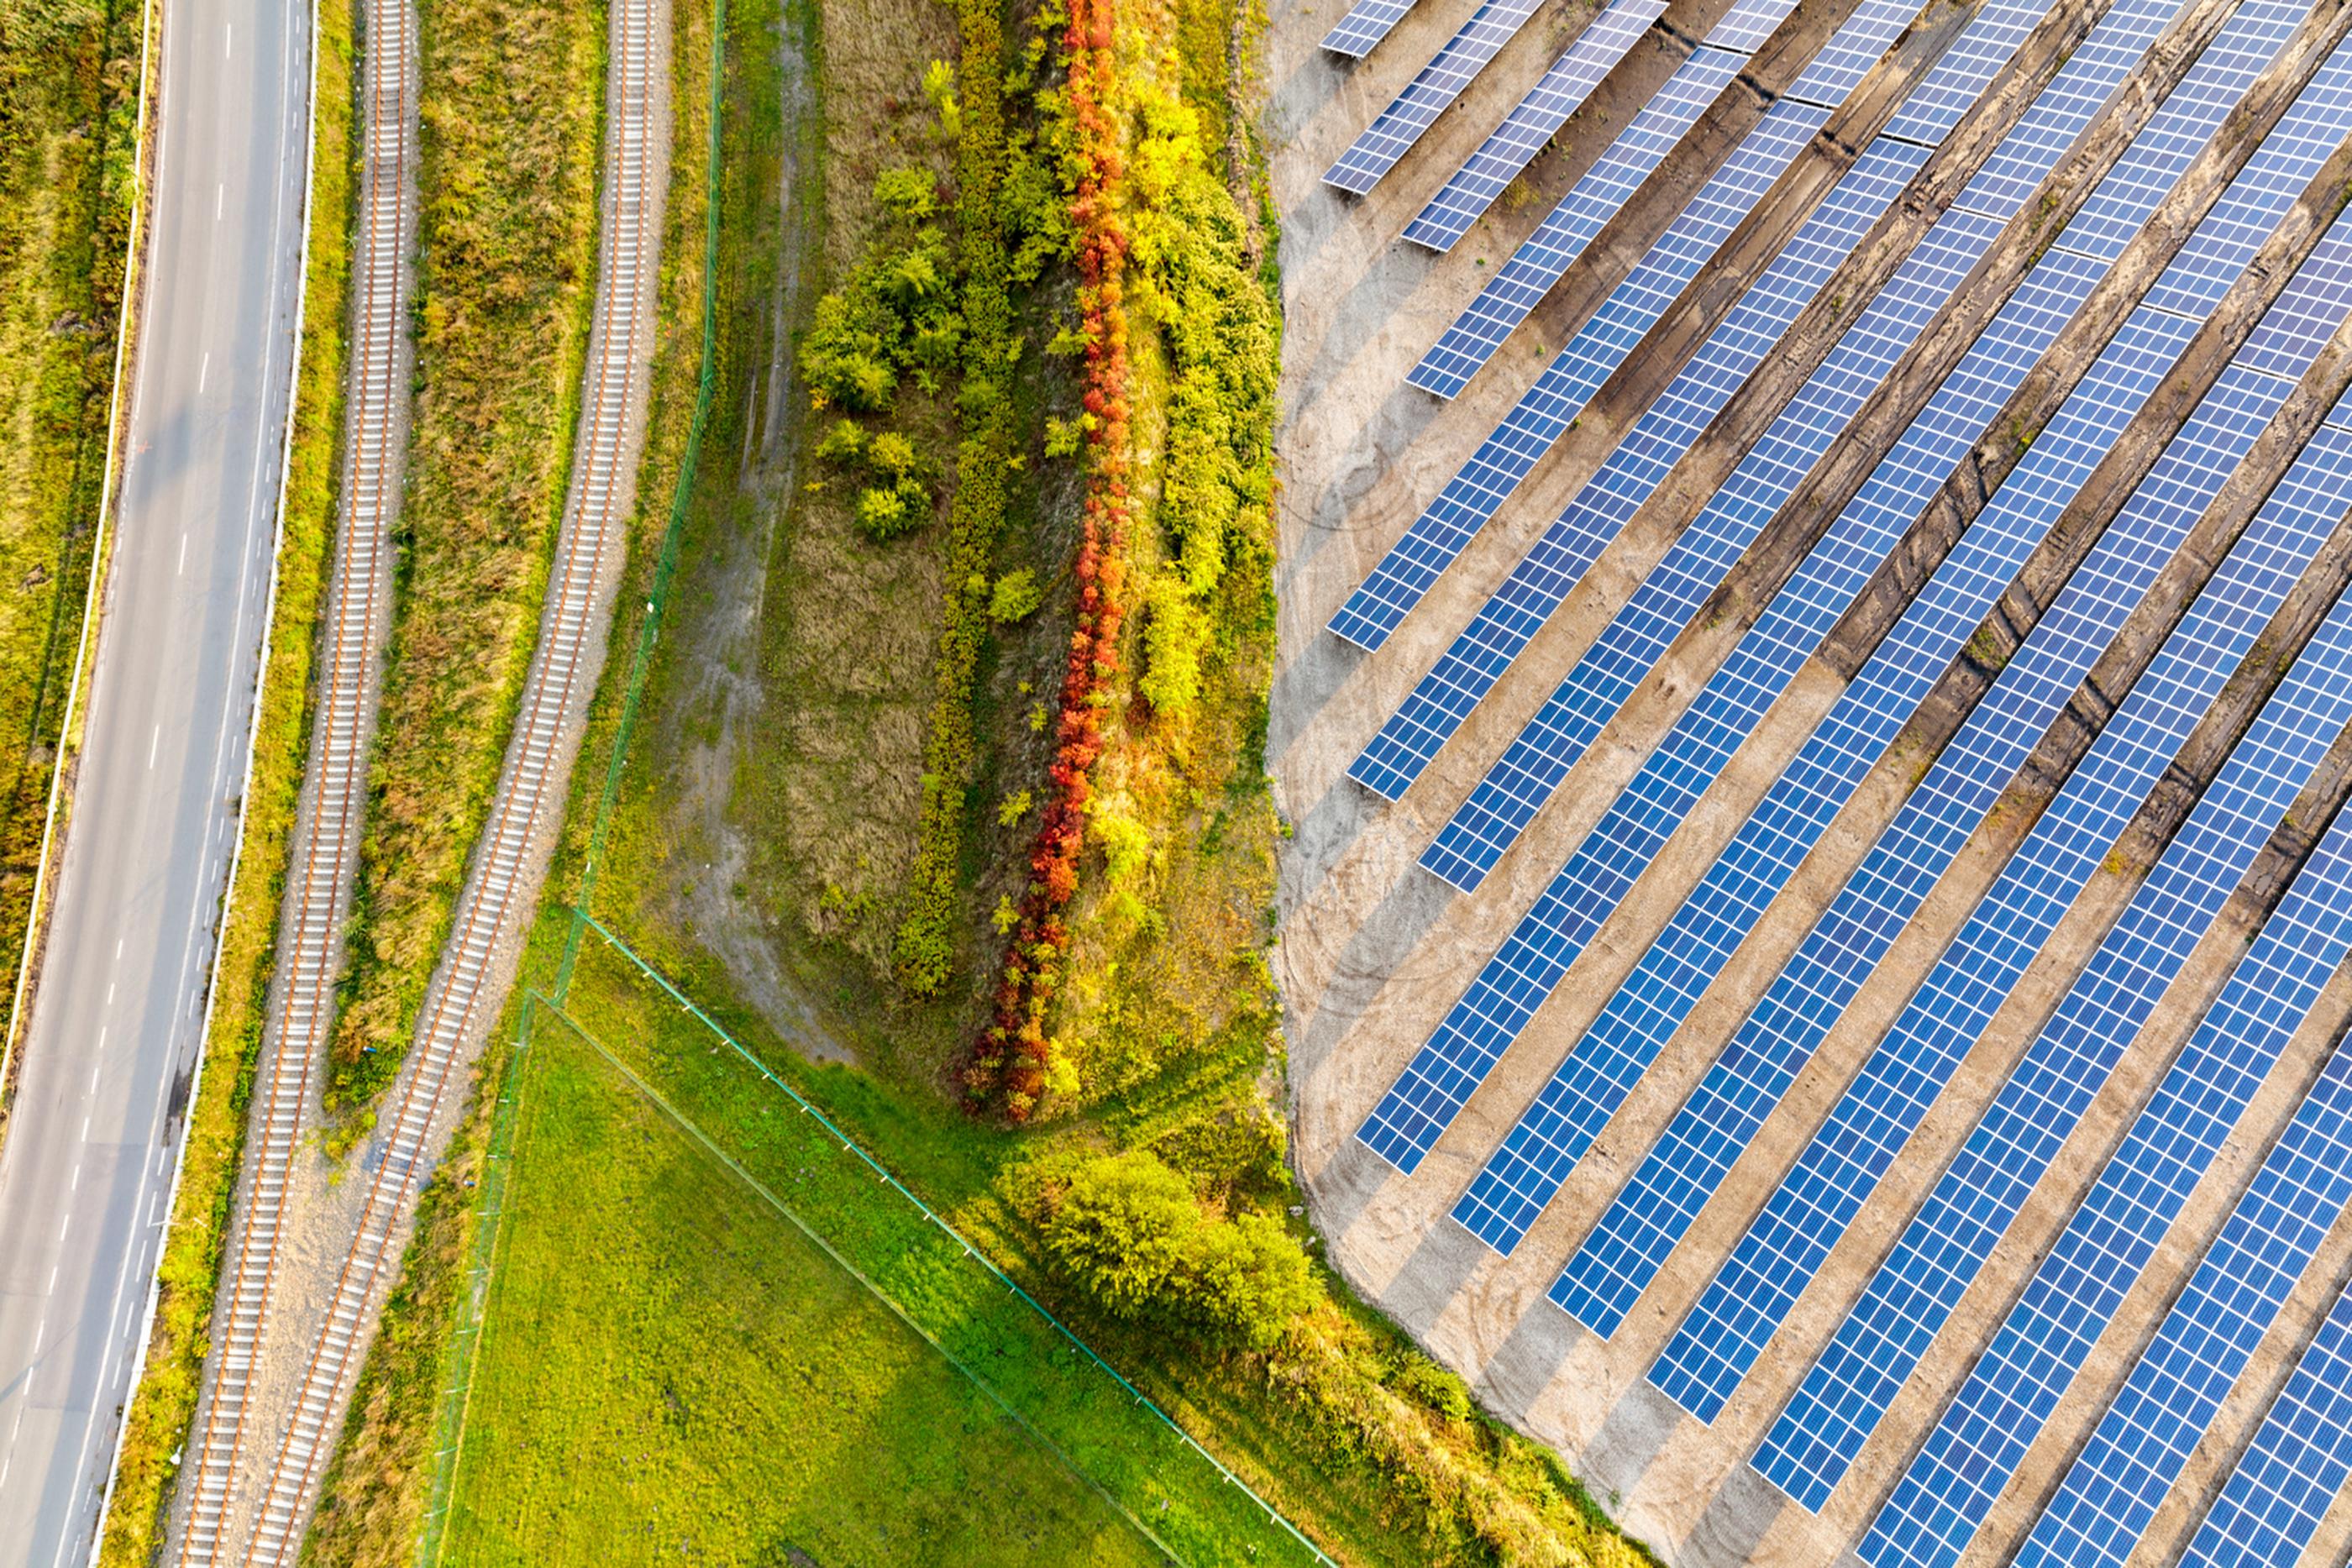 Google solar field in Saint Ghislain, Belgium (aerial)